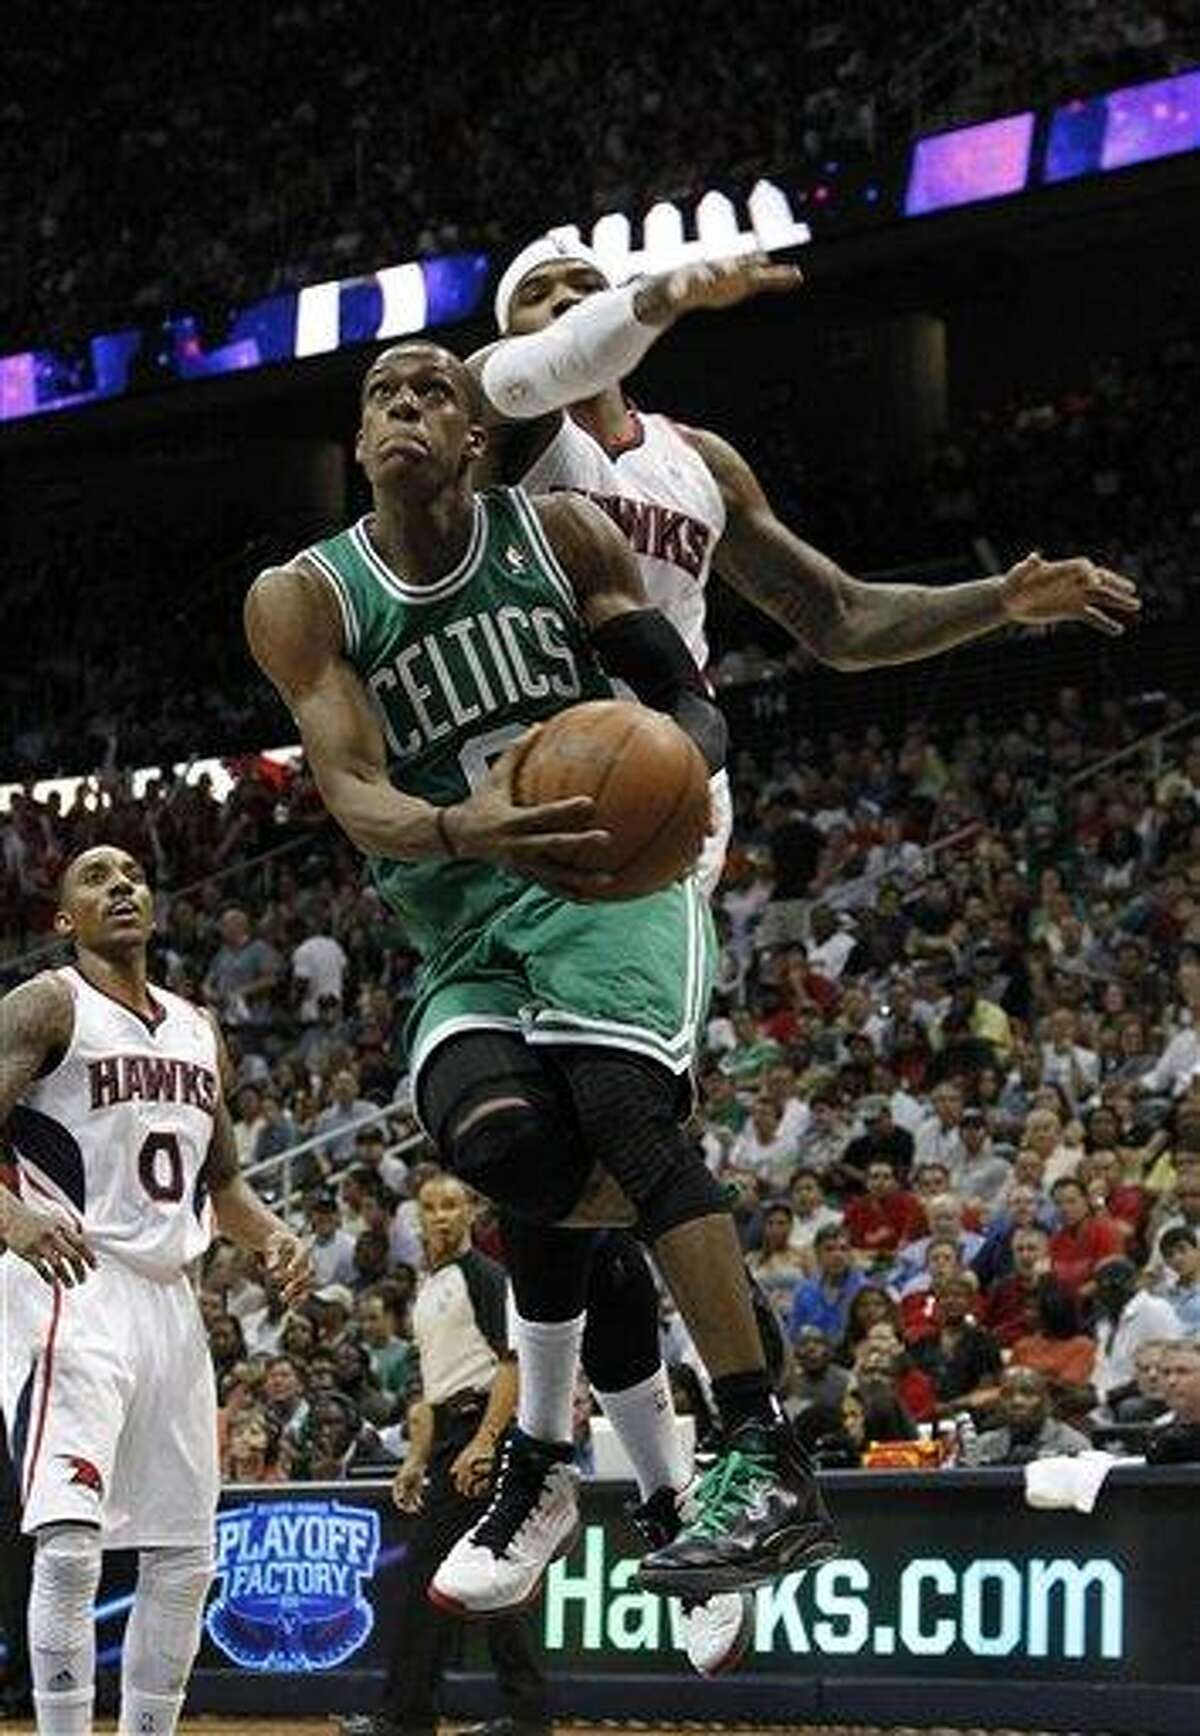 Boston Celtics point guard Rajon Rondo (9) drives as Atlanta Hawks power forward Josh Smith (5) defends during the second half of Game 5 of an NBA first-round playoff series basketball game Tuesday, May 8, 2012, in Atlanta. (AP Photo/John Bazemore)